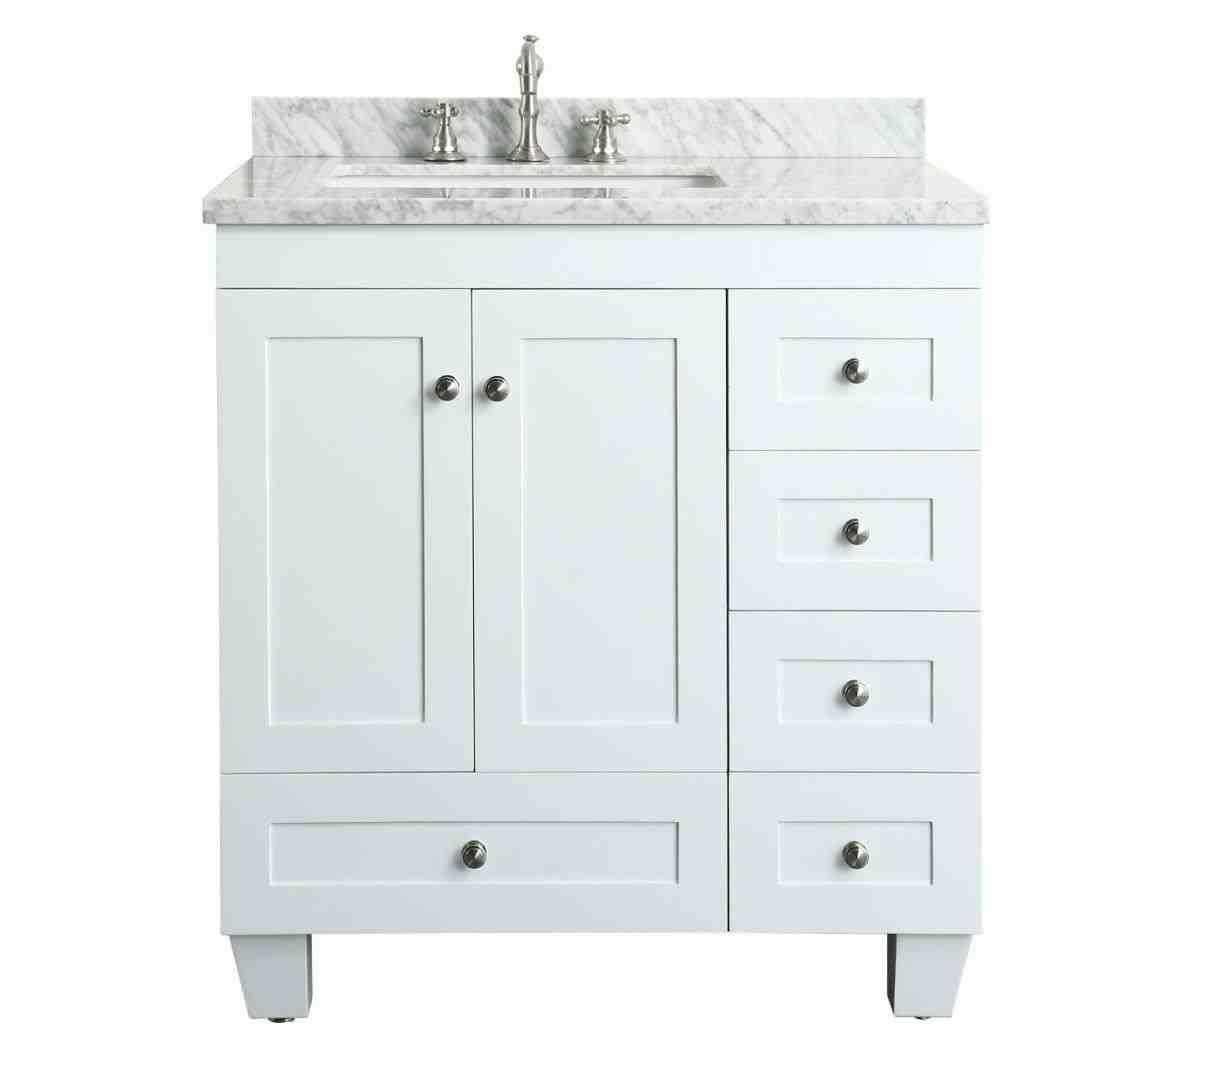 30 Inch Bathroom Vanity With Top